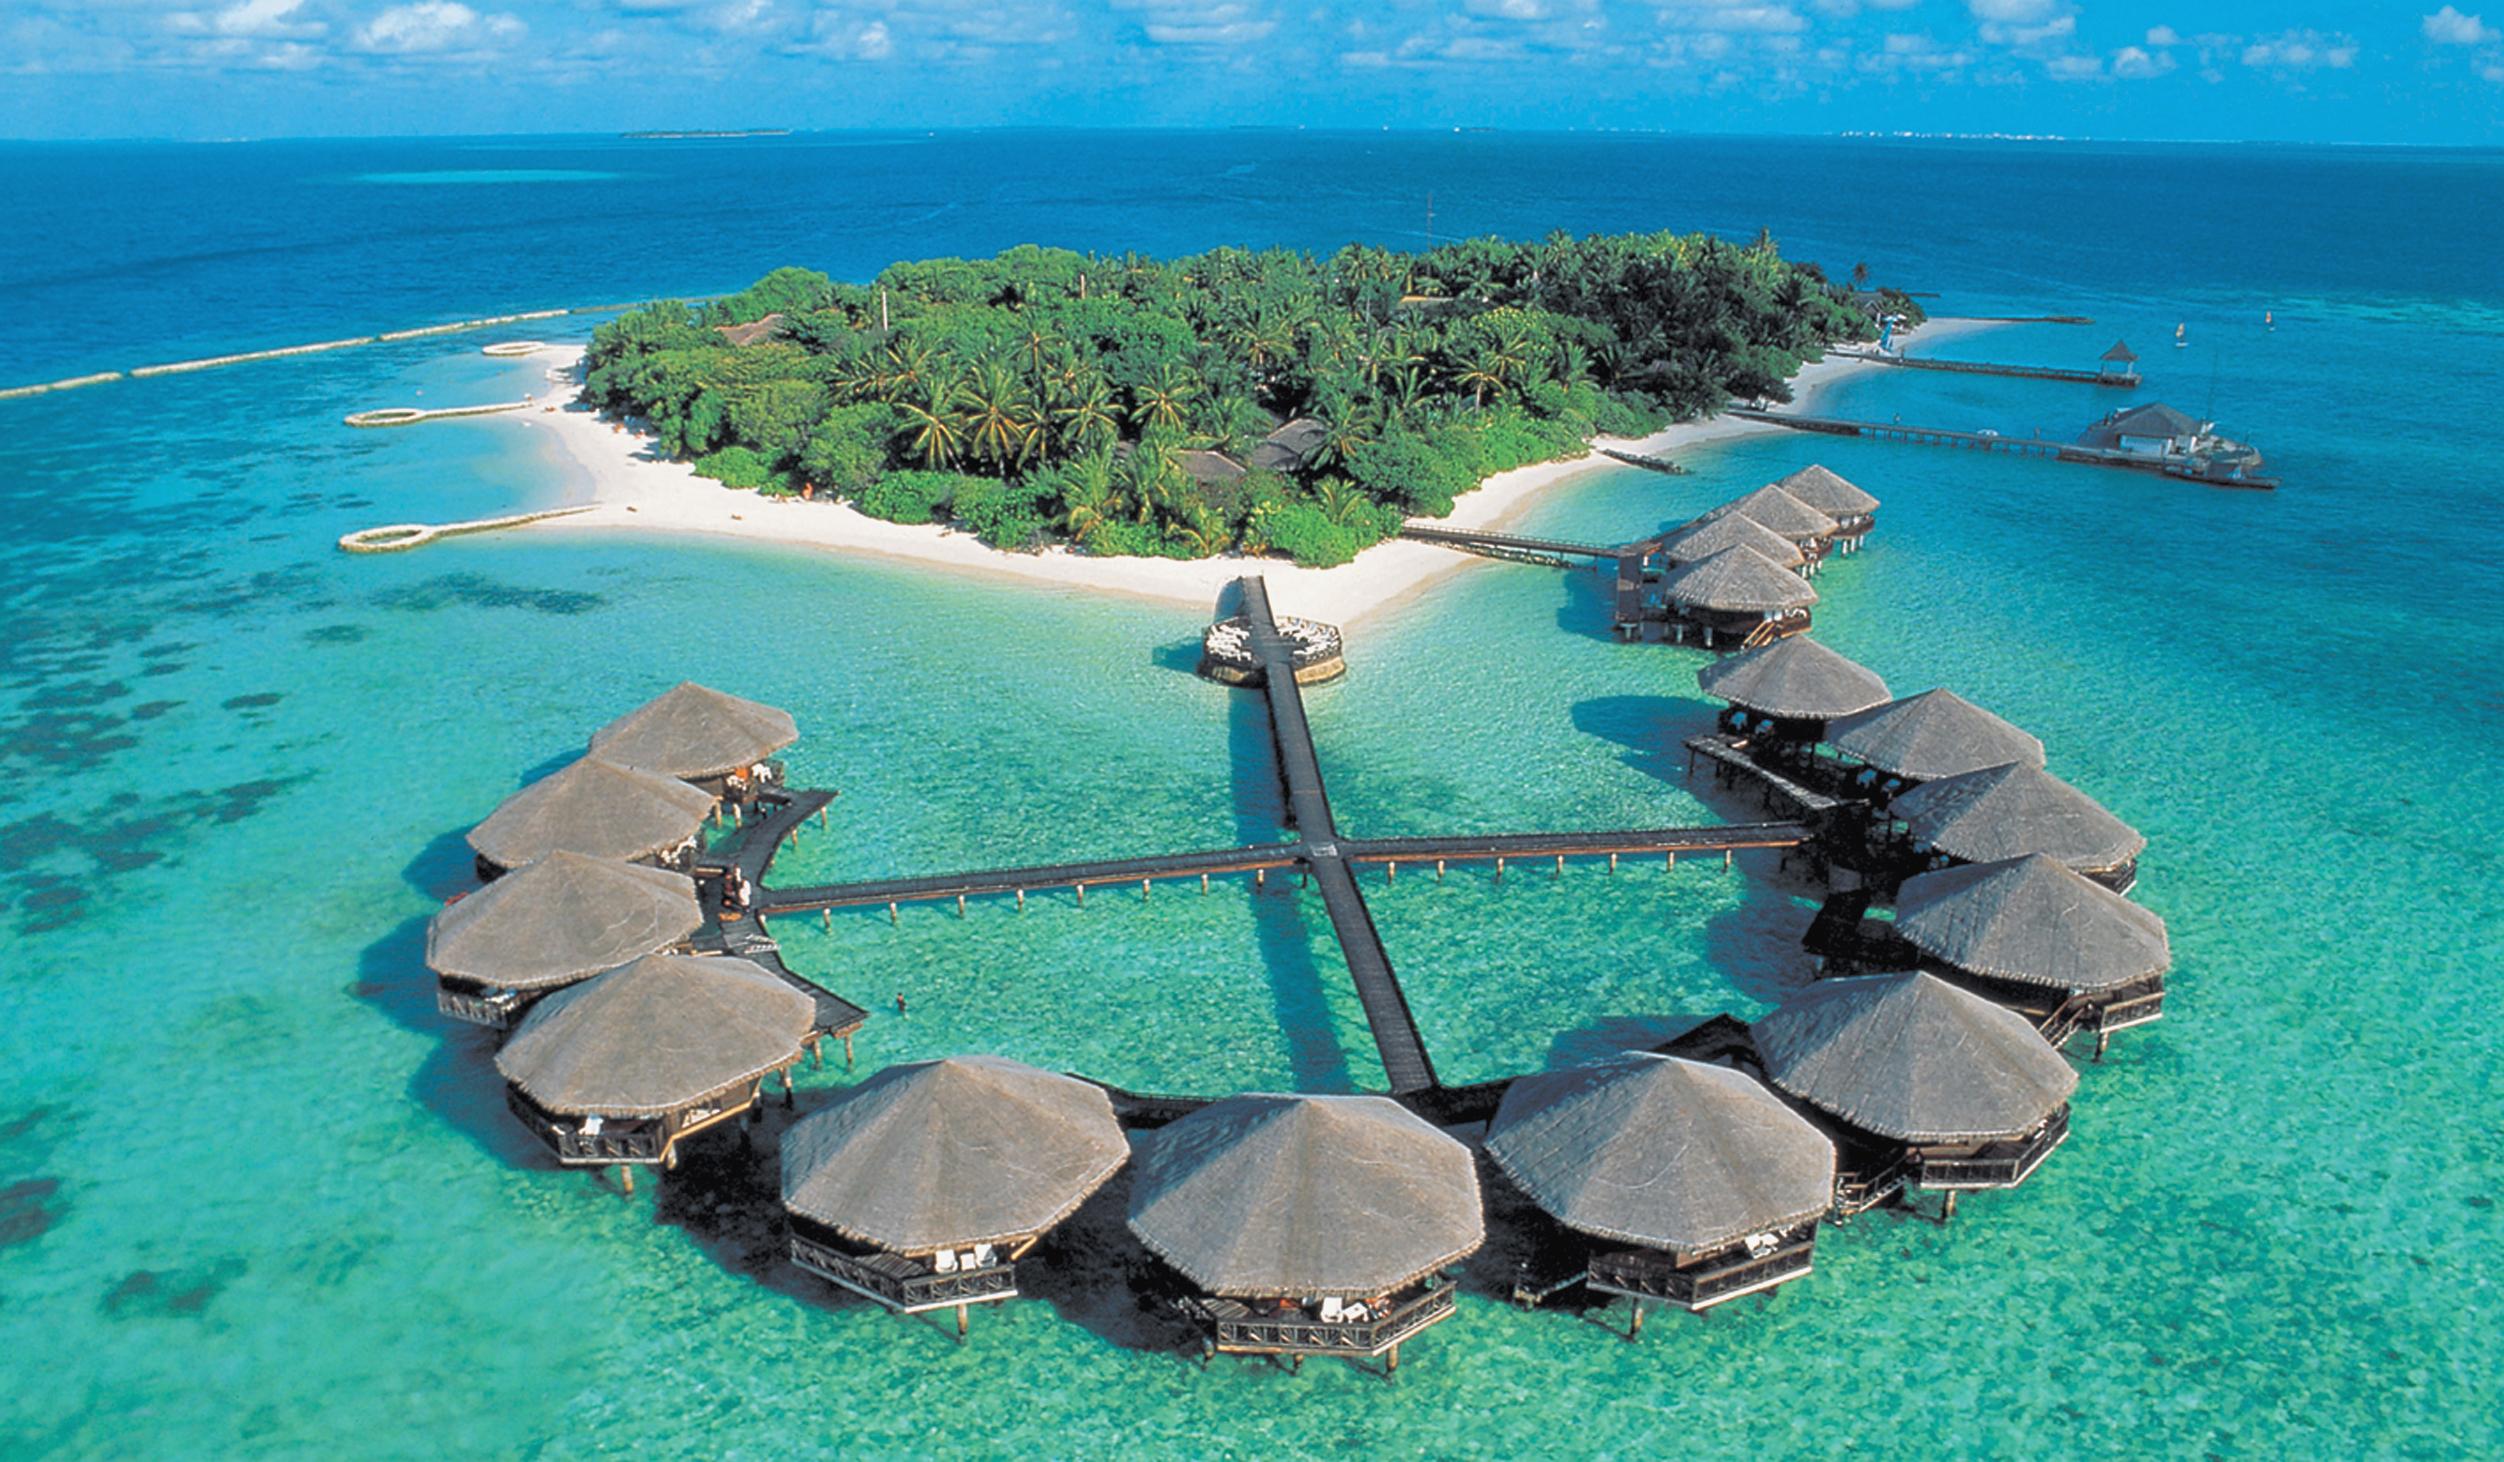 Maldives Island Desktop Backgrounds   Free Maldives Island Desktop ...